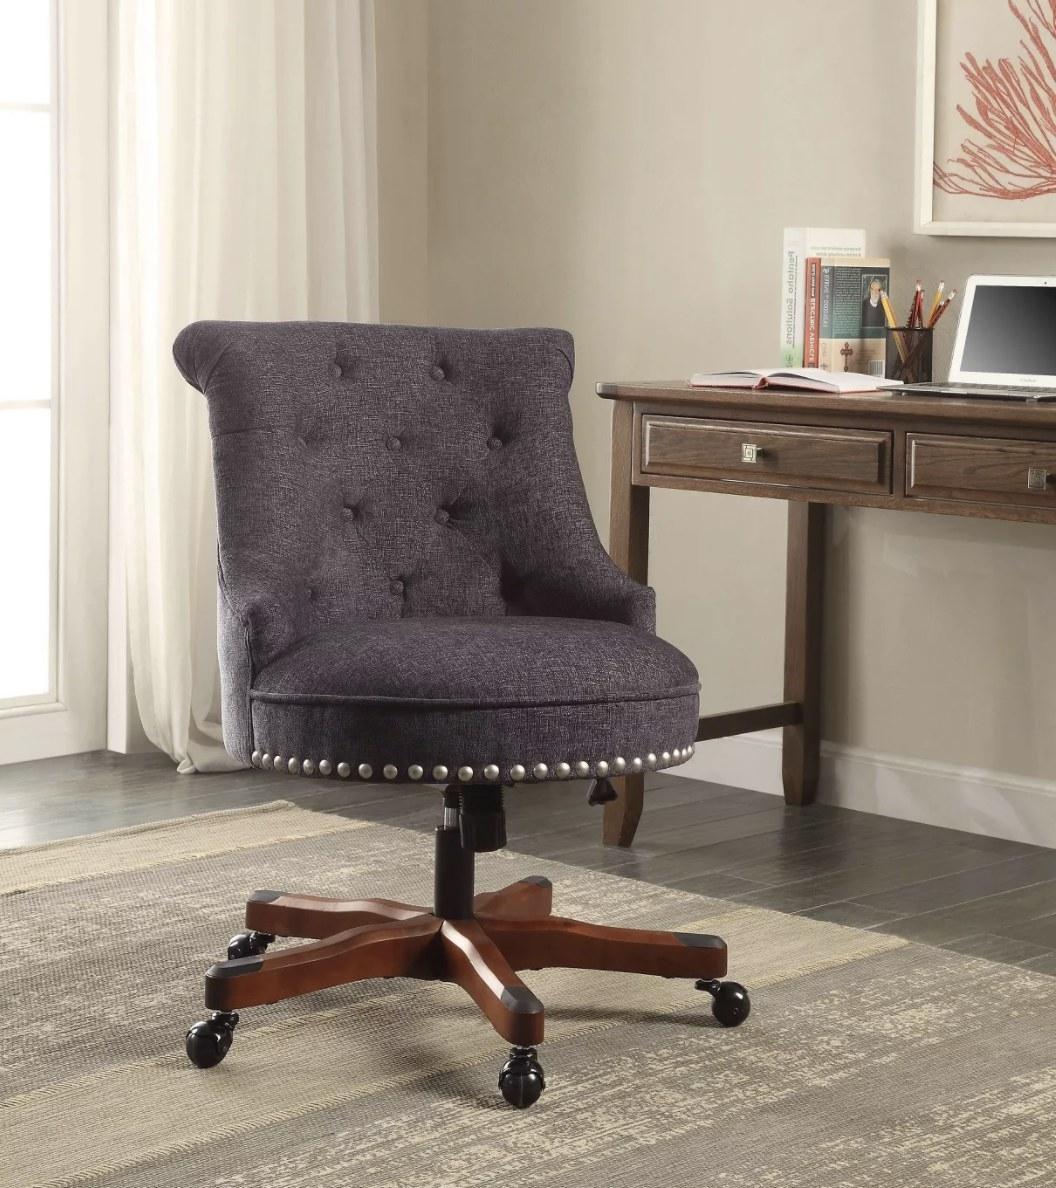 A wheeled armless office chair in dark blue